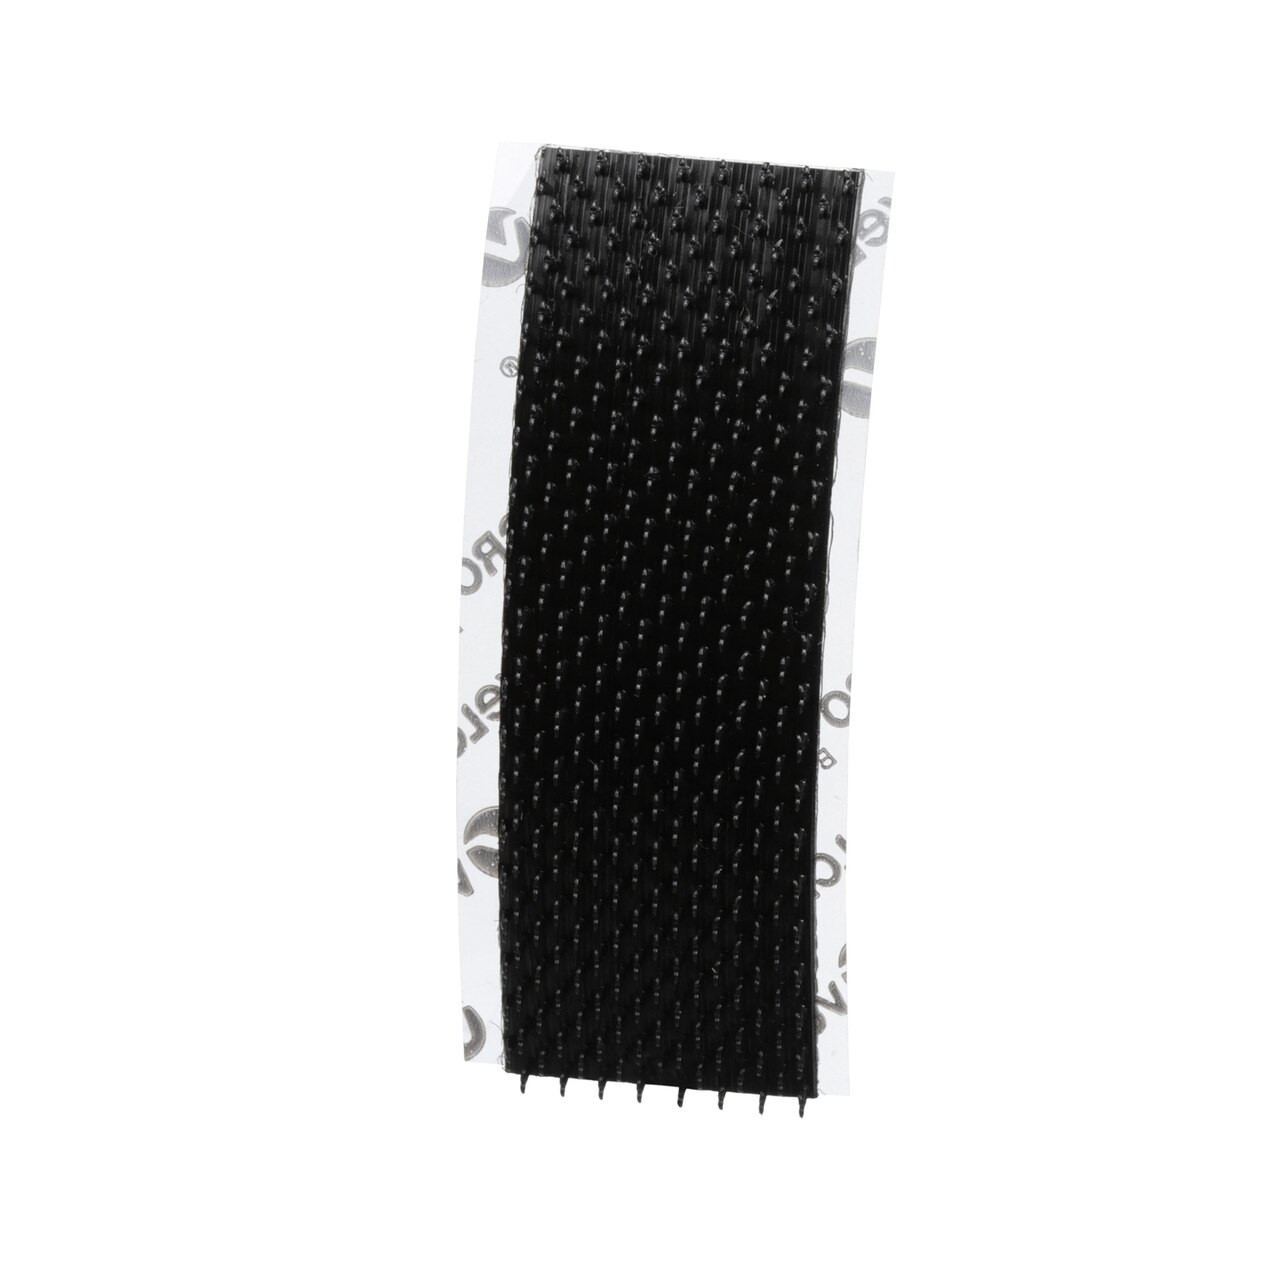 VELCRO Brand MVA #8 / Velcro Fasteners